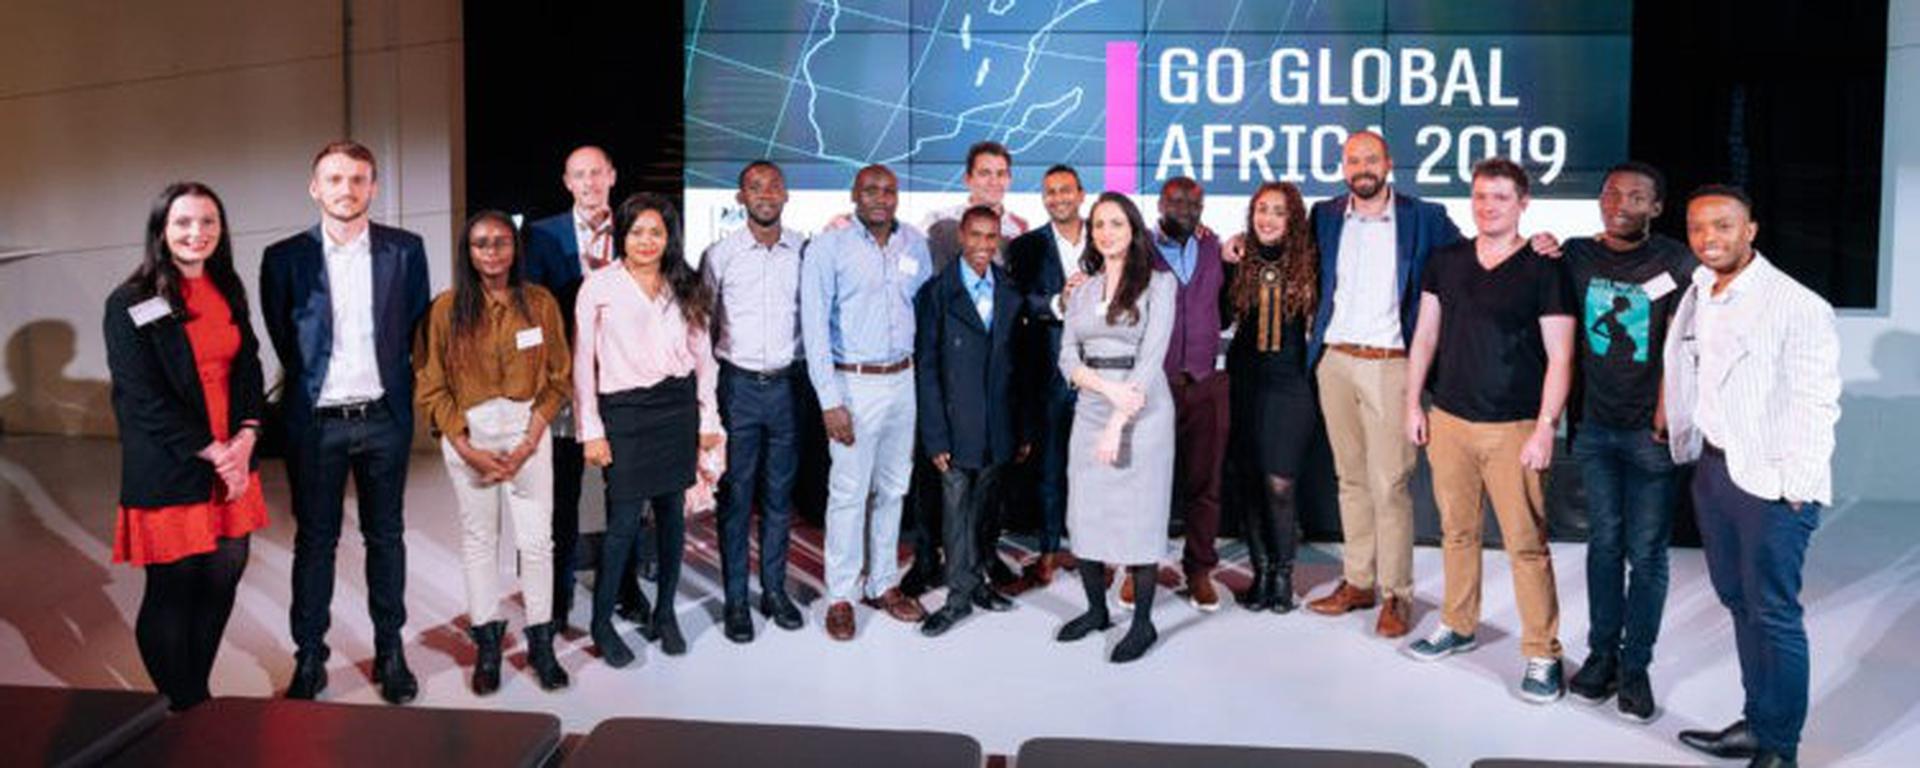 International Tech Hub Network (ITHN) - Go Global Africa 2020 Movemeback African initiative cover image